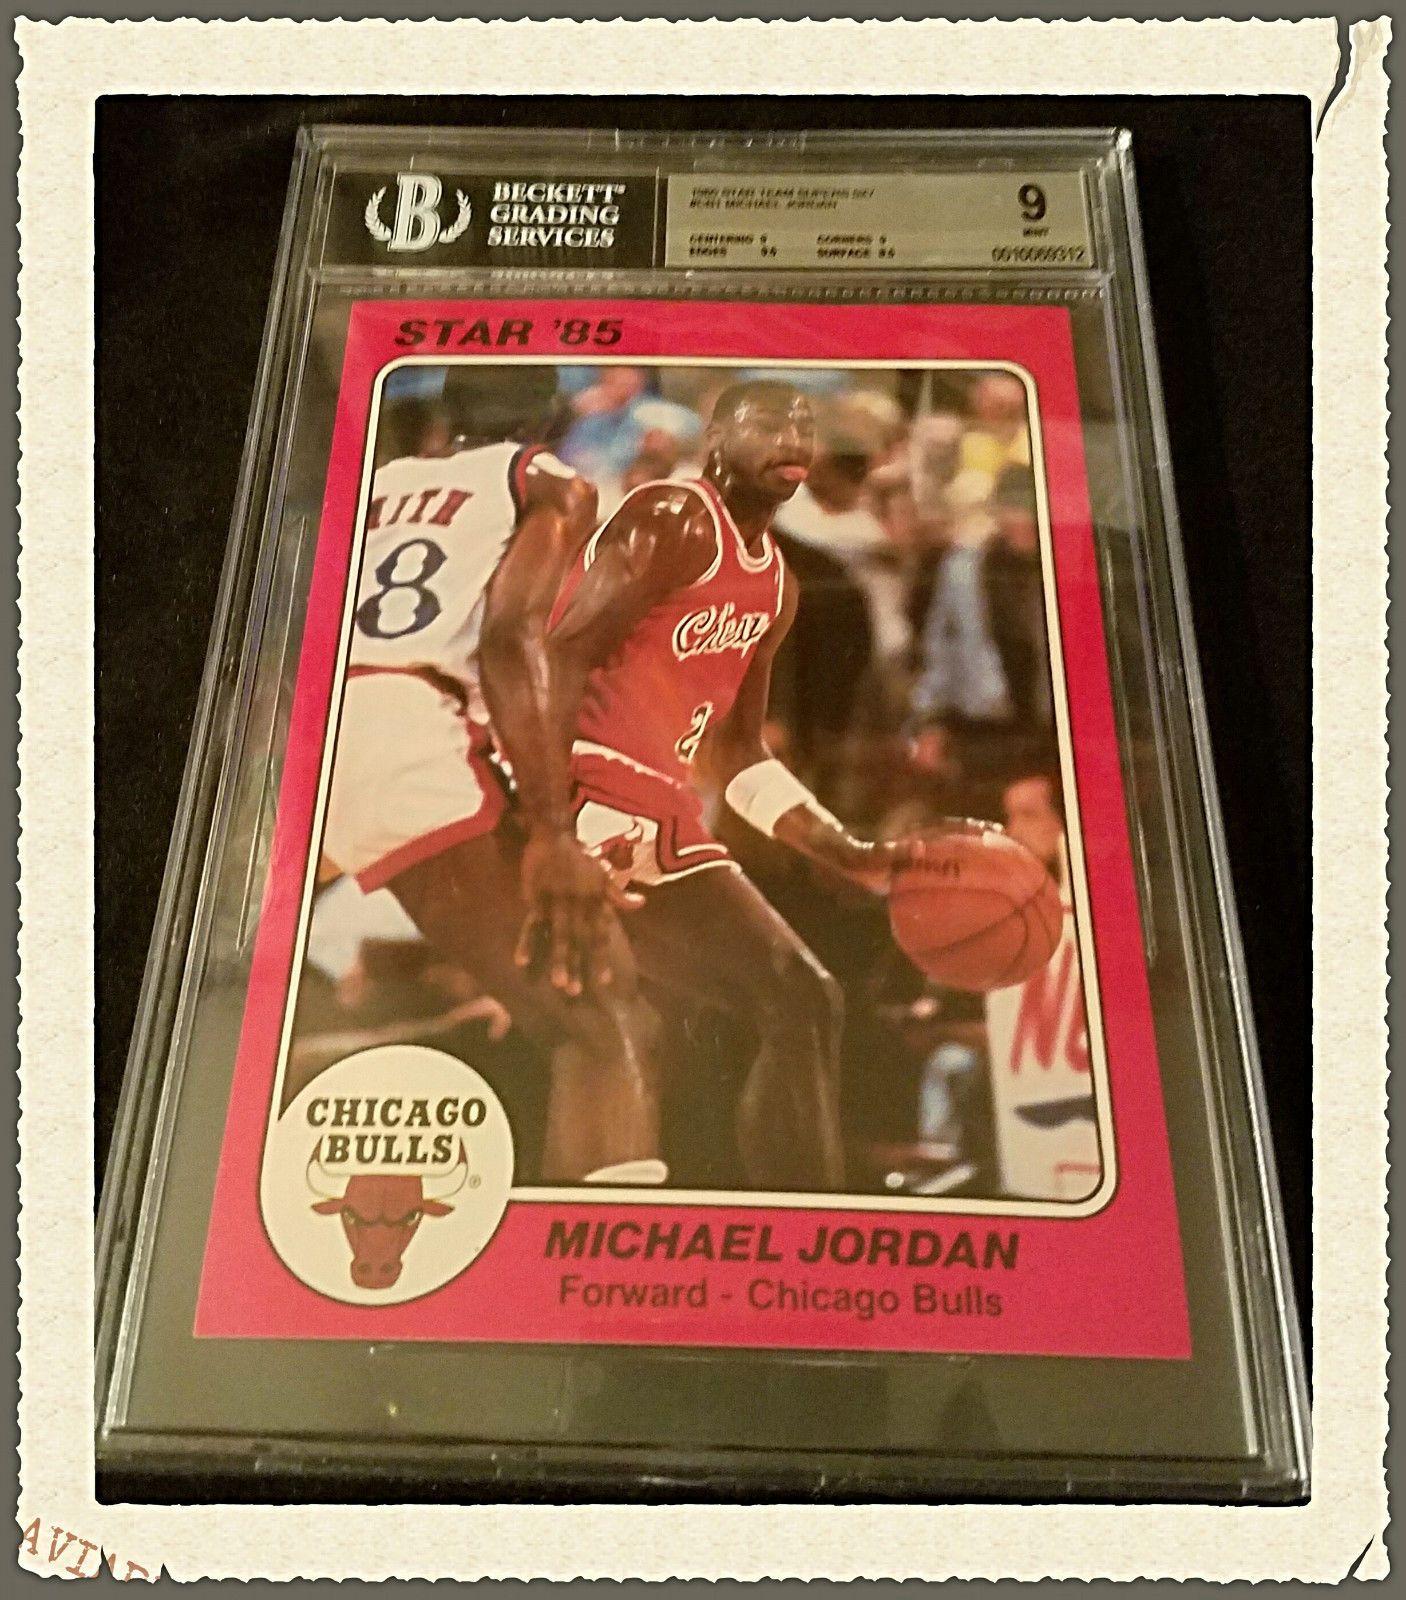 1985 star rc michael jordan rookie team supers card